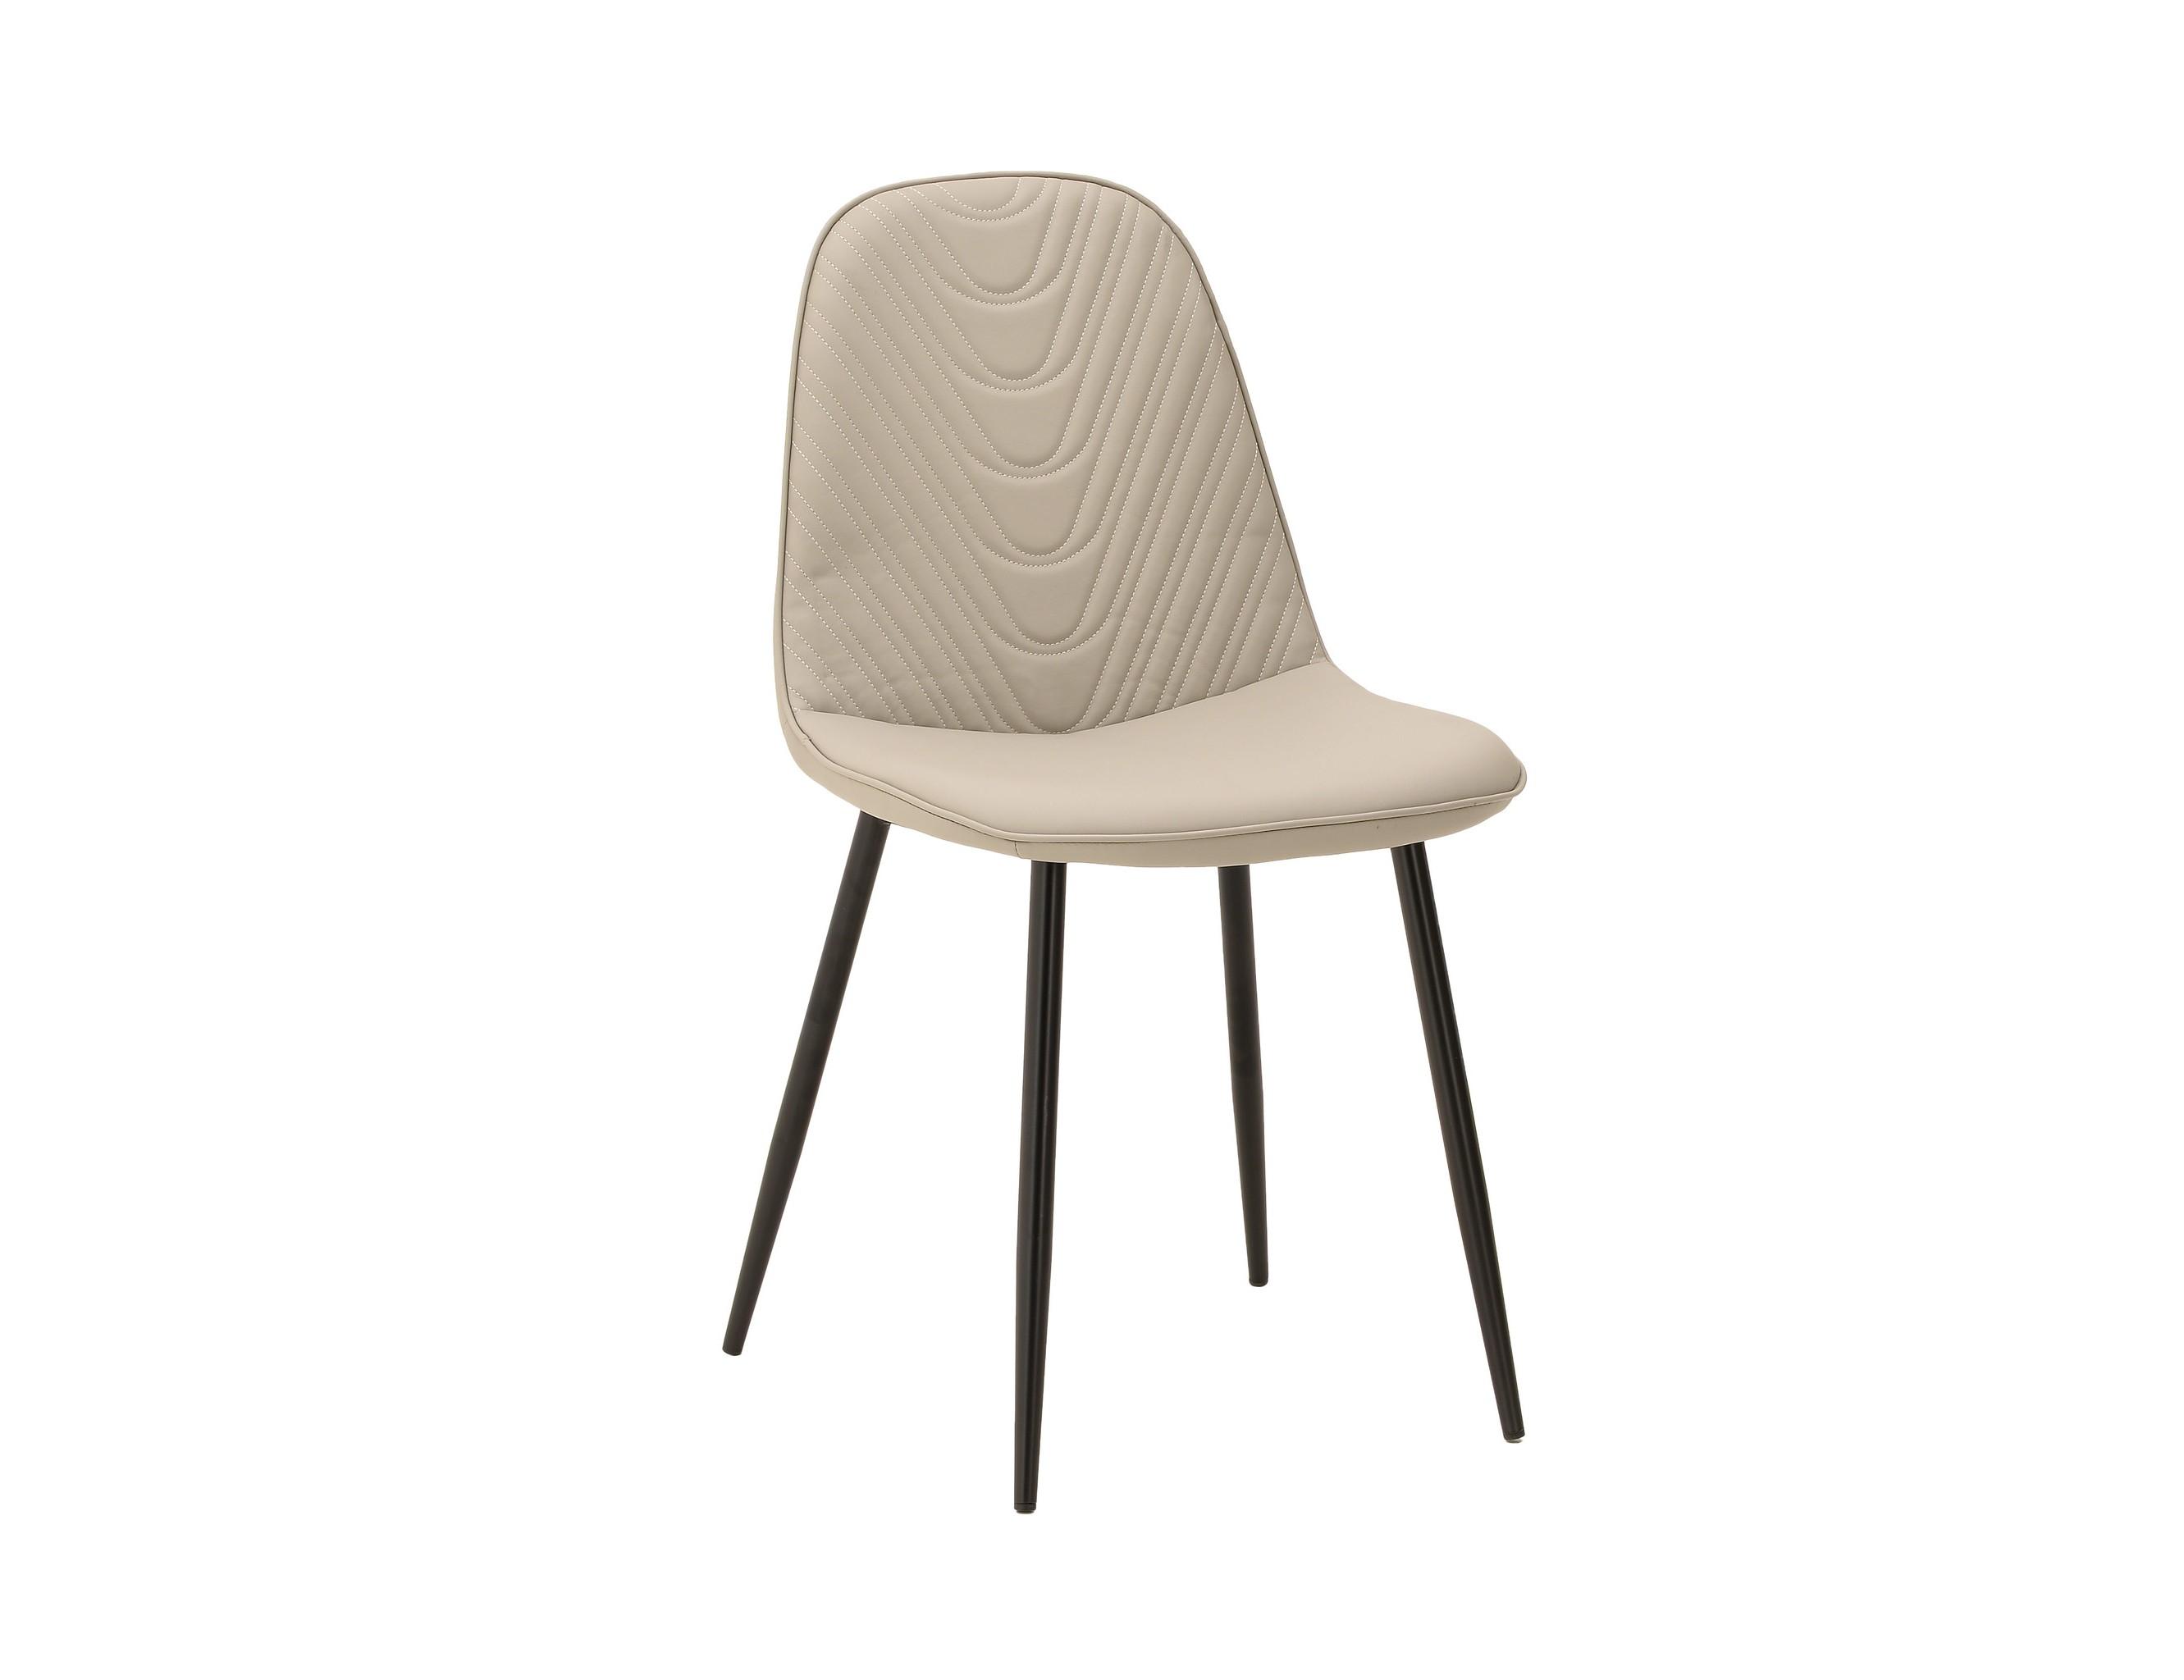 Стул AntrefortОбеденные стулья<br>Материал: металл. экокожа<br><br>Material: Экокожа<br>Width см: 45<br>Depth см: 43<br>Height см: 86